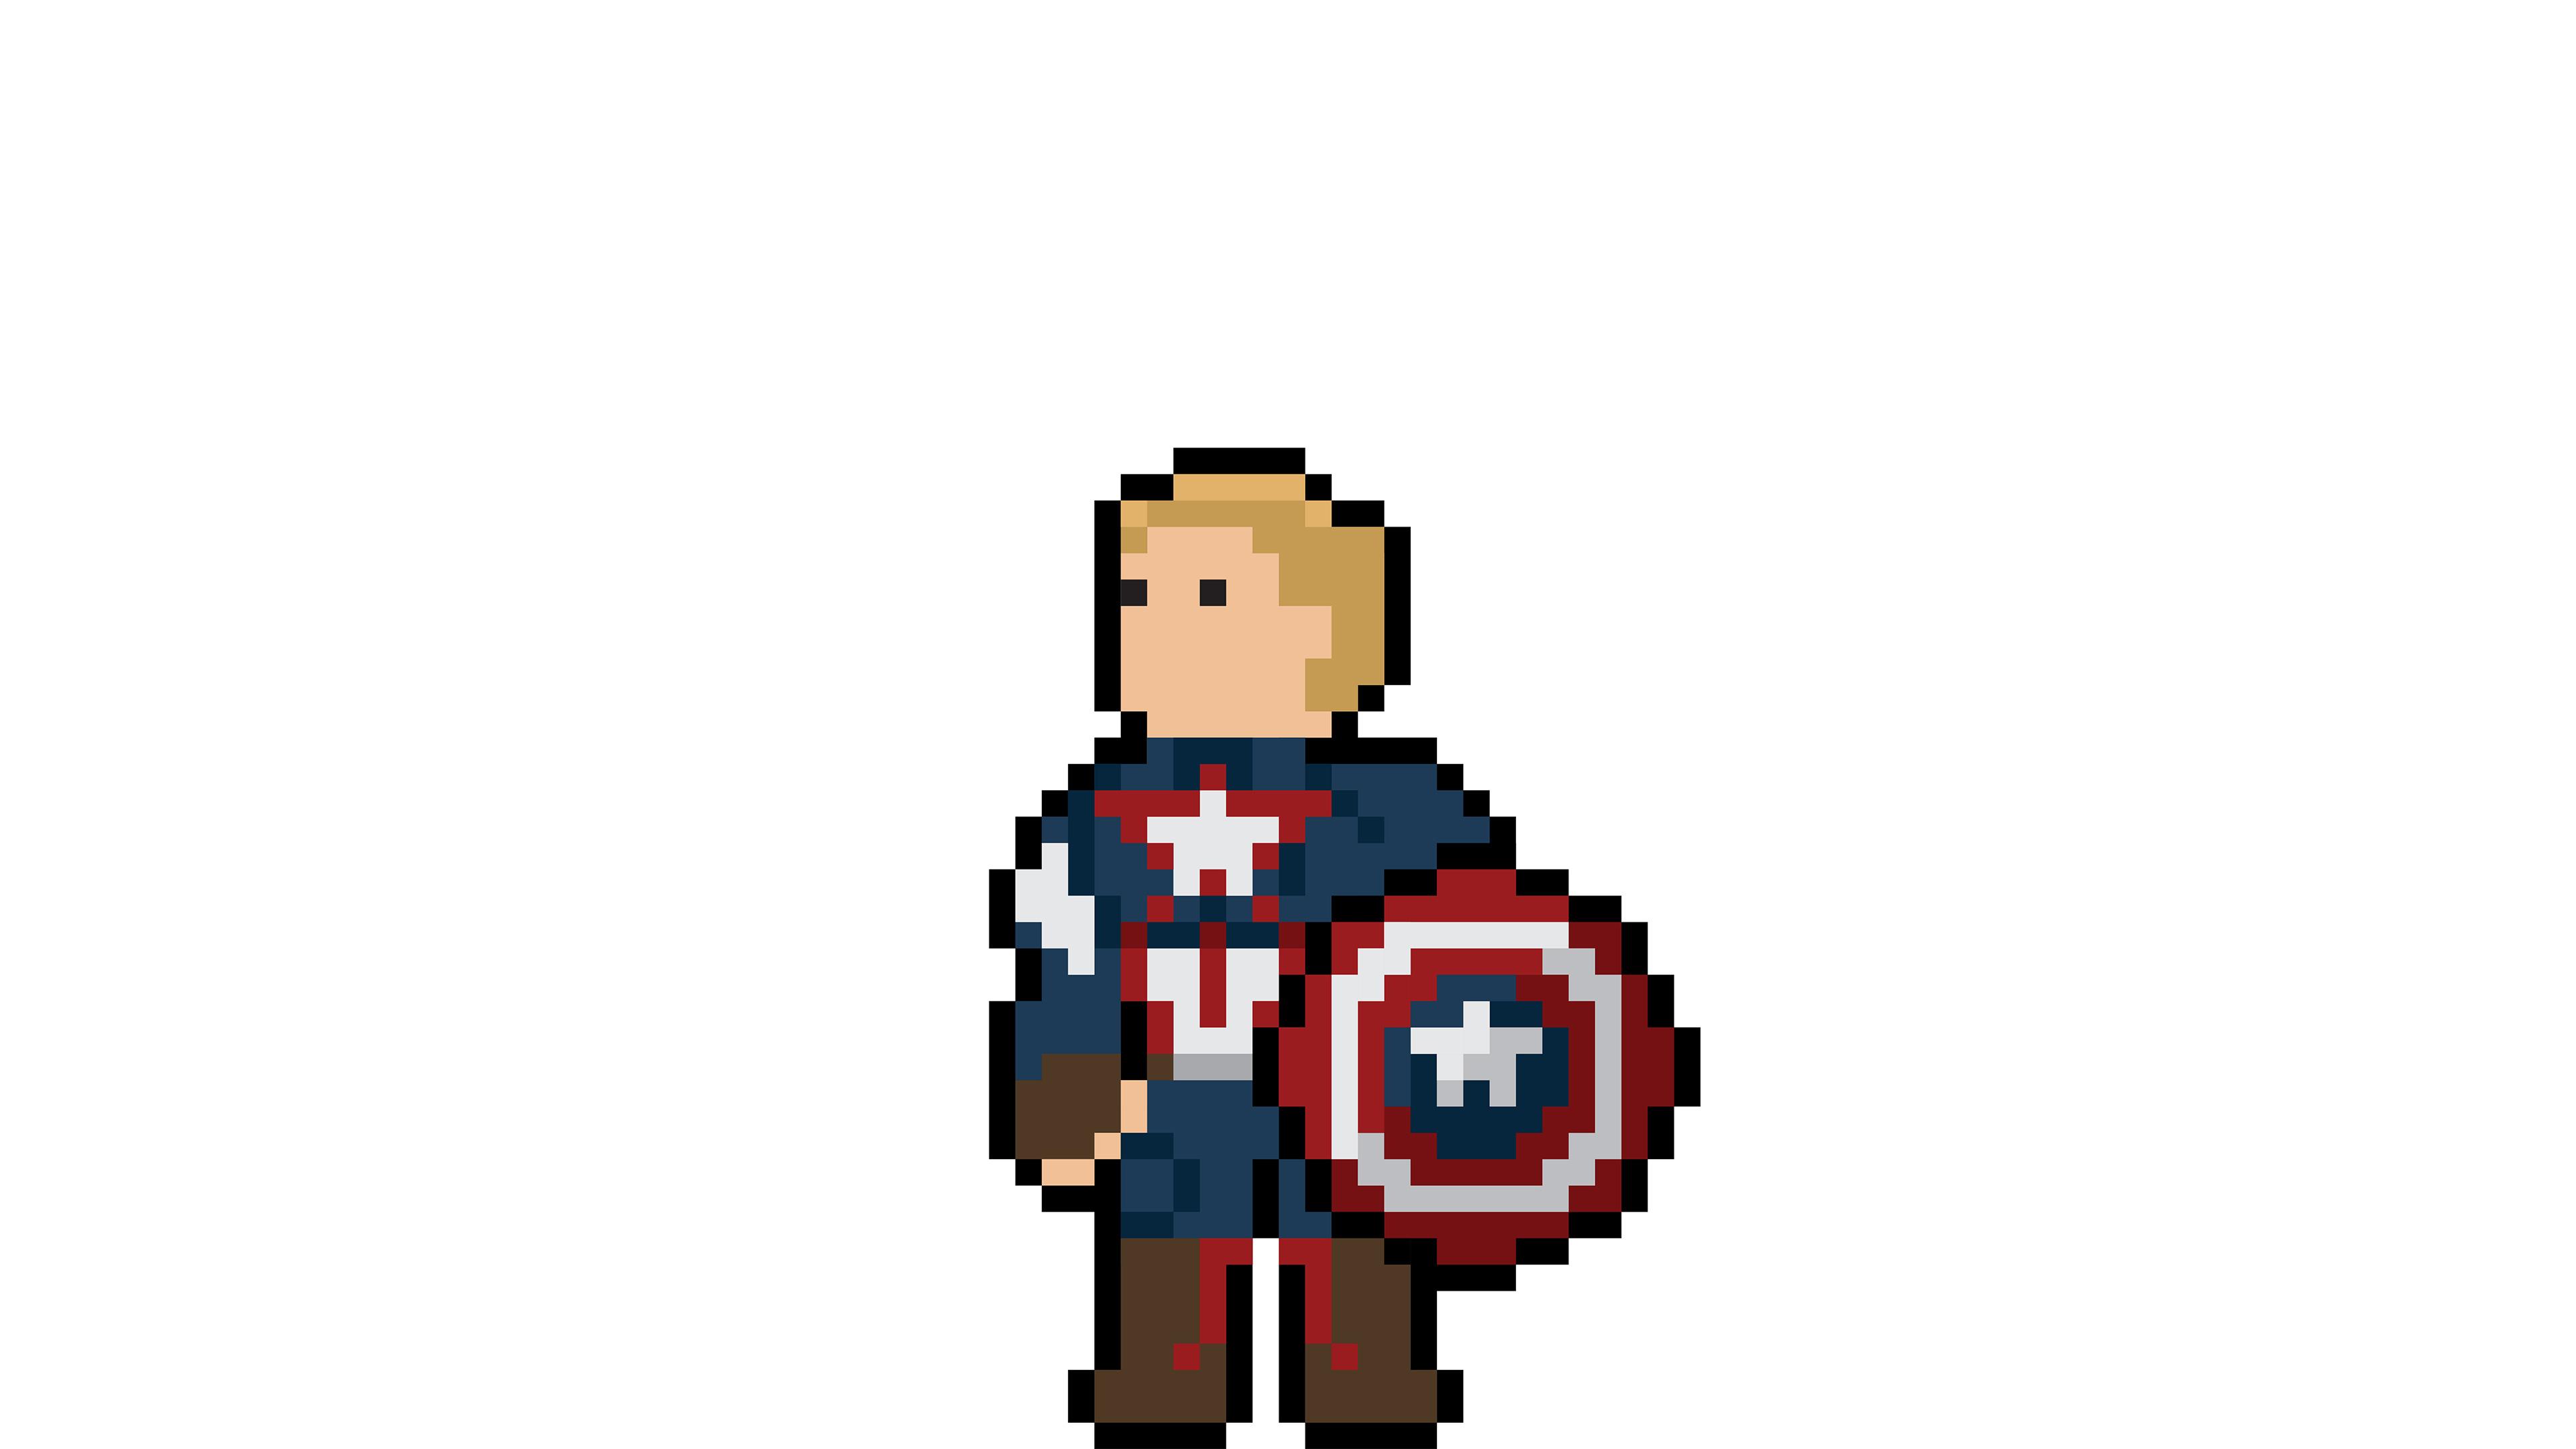 captain america pixel art 1536522502 - Captain America Pixel Art - superheroes wallpapers, pixel wallpapers, hd-wallpapers, digital art wallpapers, captain america wallpapers, behance wallpapers, artwork wallpapers, artist wallpapers, art wallpapers, 4k-wallpapers